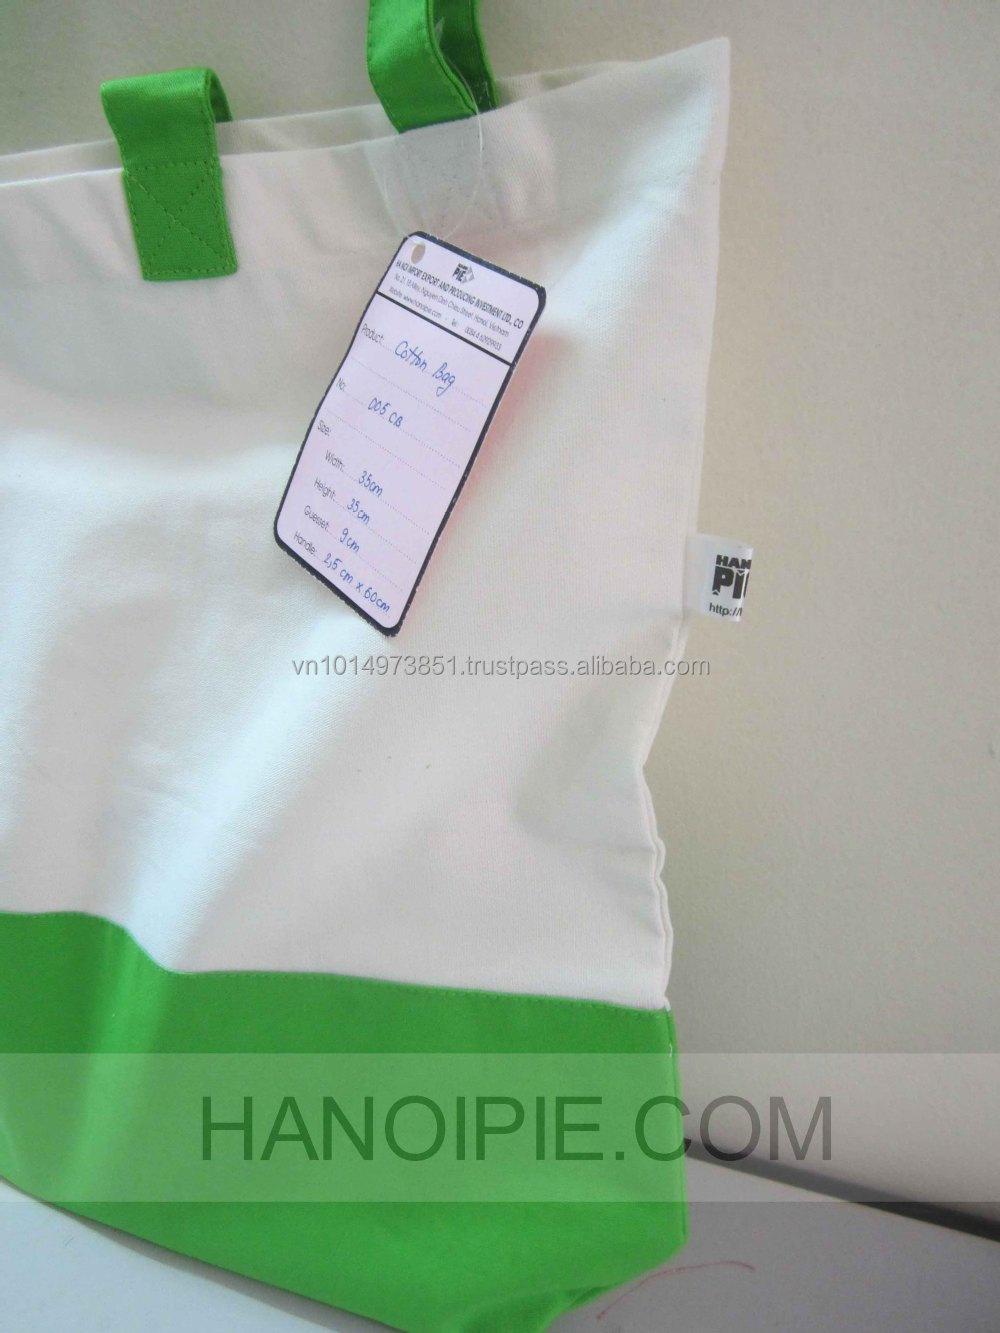 Promotional Cotton Bag  Gift Bags Wholesale 005CB 3.jpg